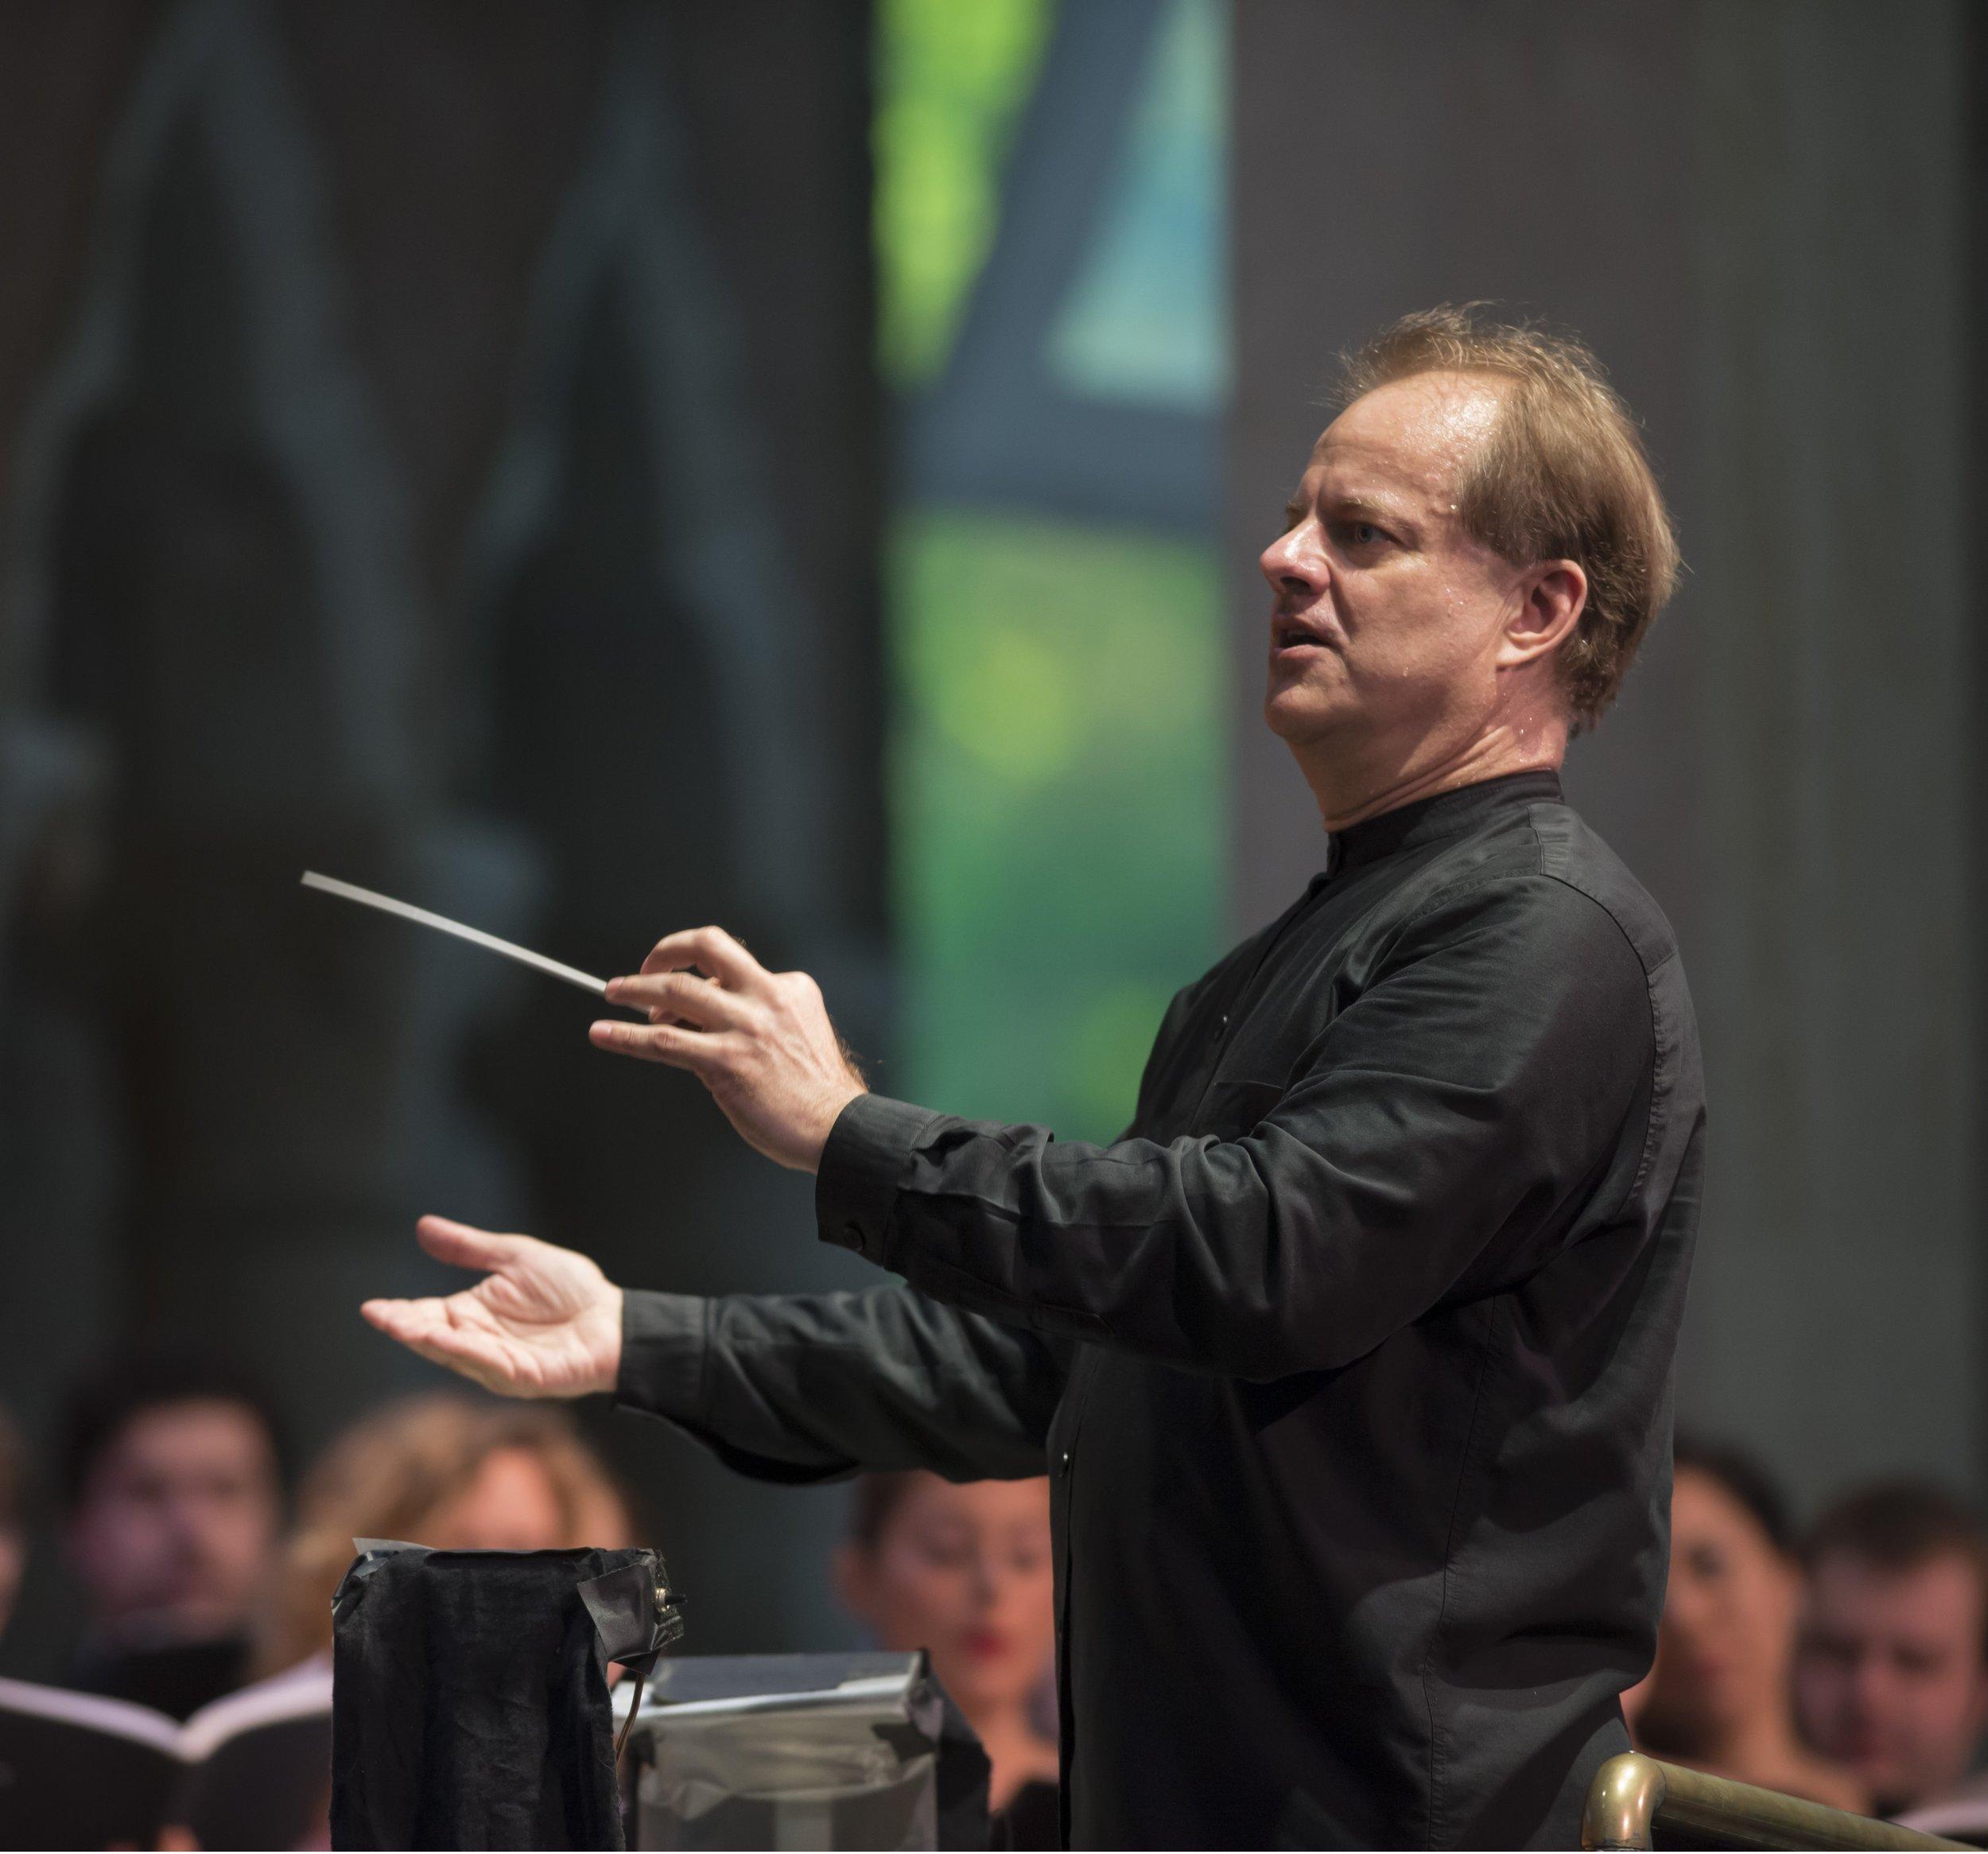 Will Crutchfield conducting Guillaume Tell, photo © Gabe Palacio